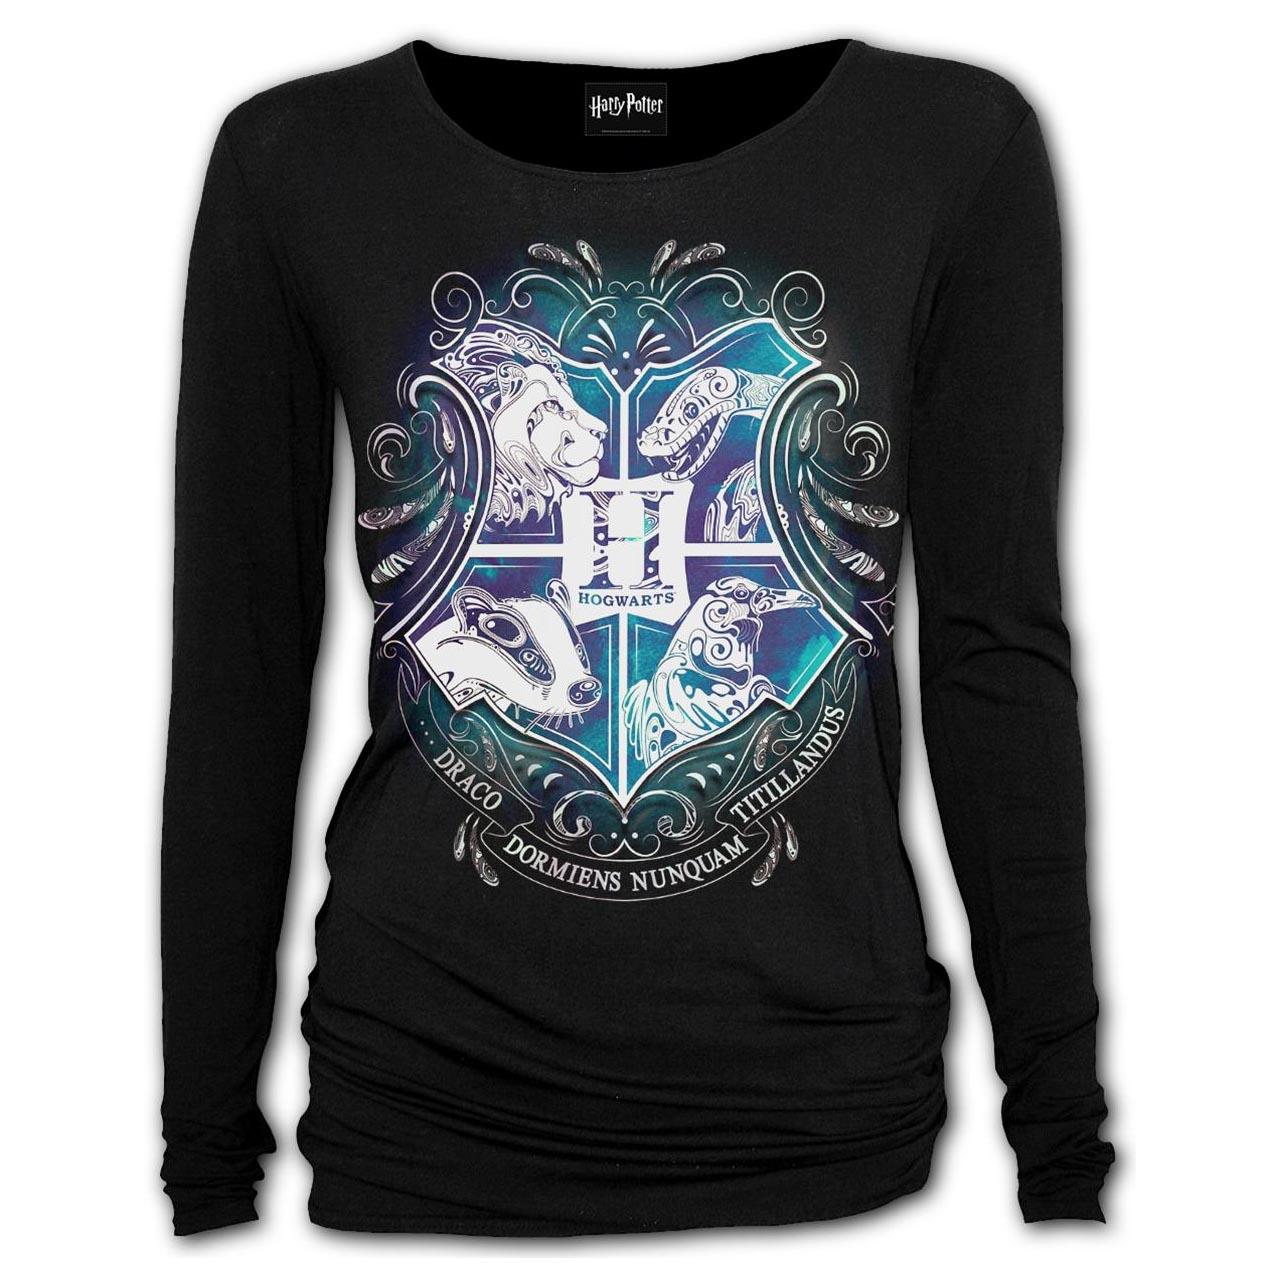 Spiral-Ladies-Black-Harry-Potter-HOGWARTS-Crest-L-Sleeve-Top-All-Sizes thumbnail 5